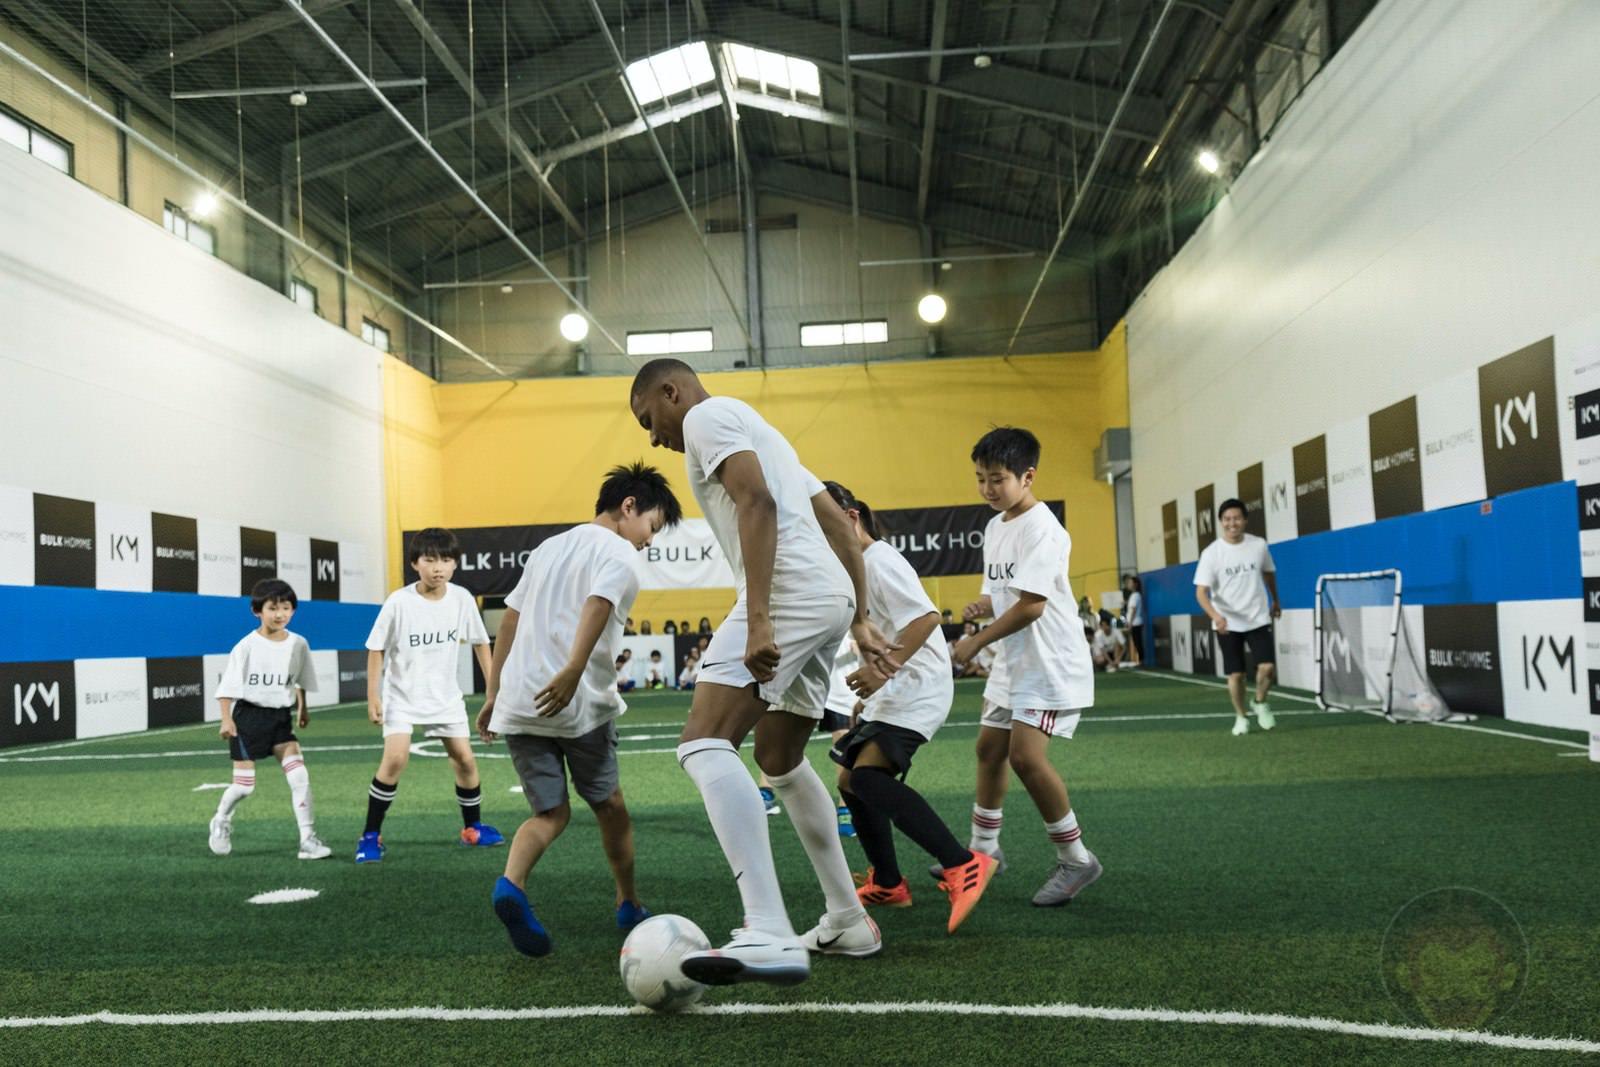 Kylian Mbappé plays soccer with kids 15